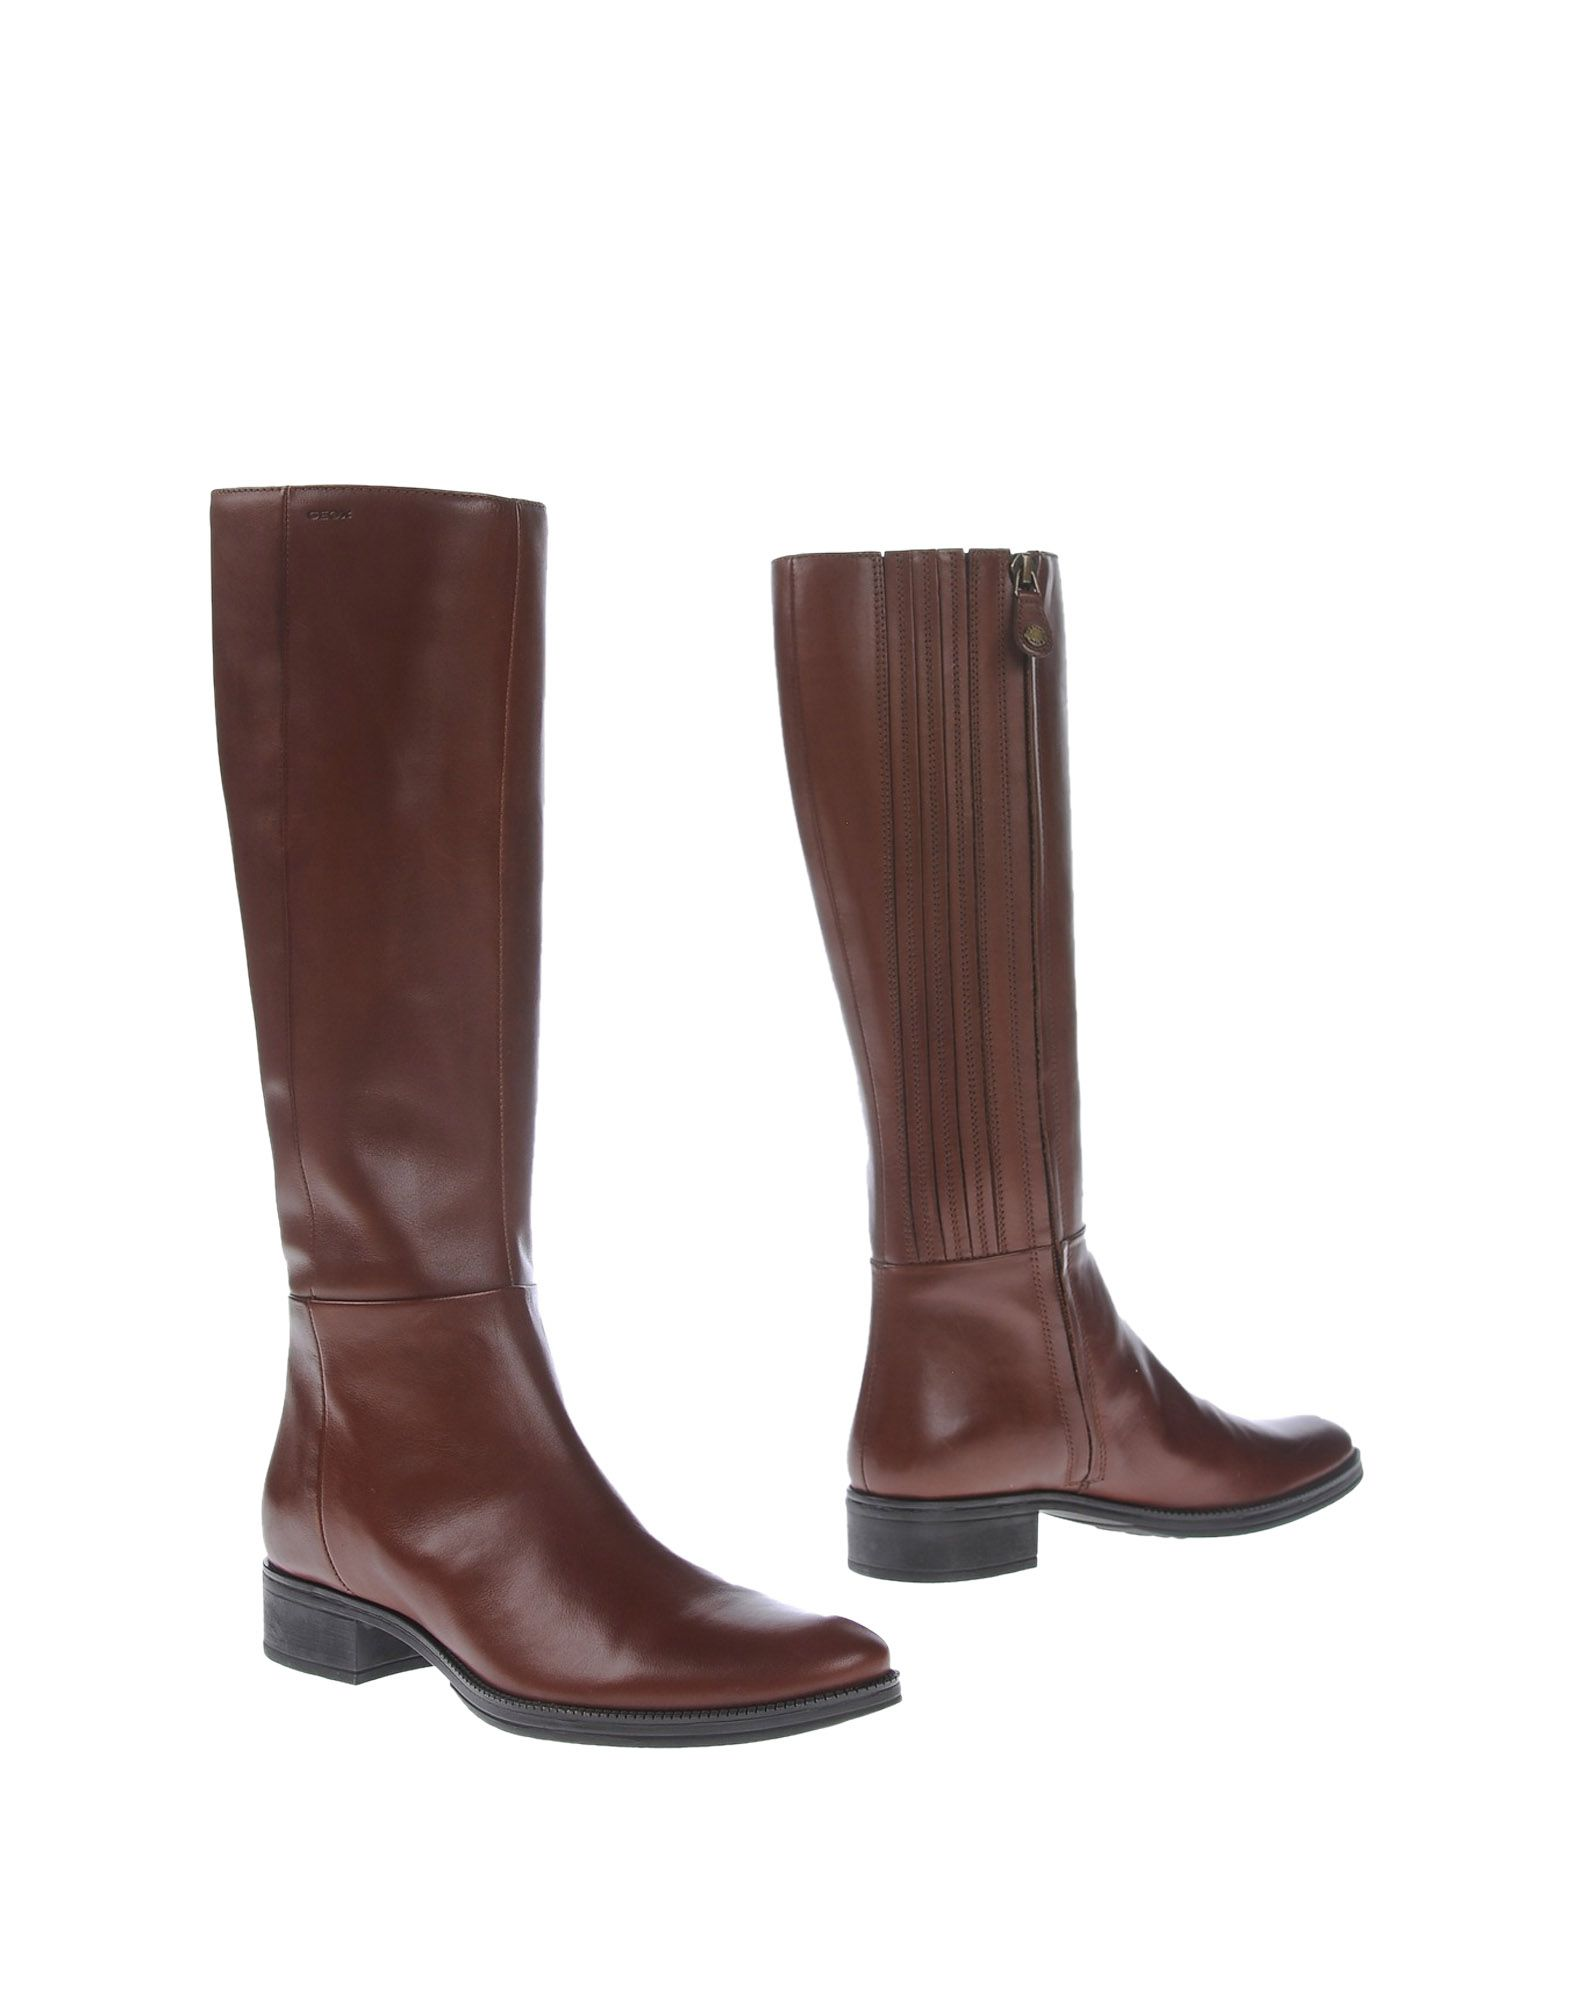 Geox Boots - Women Geox United Boots online on  United Geox Kingdom - 11084657XO cb8725